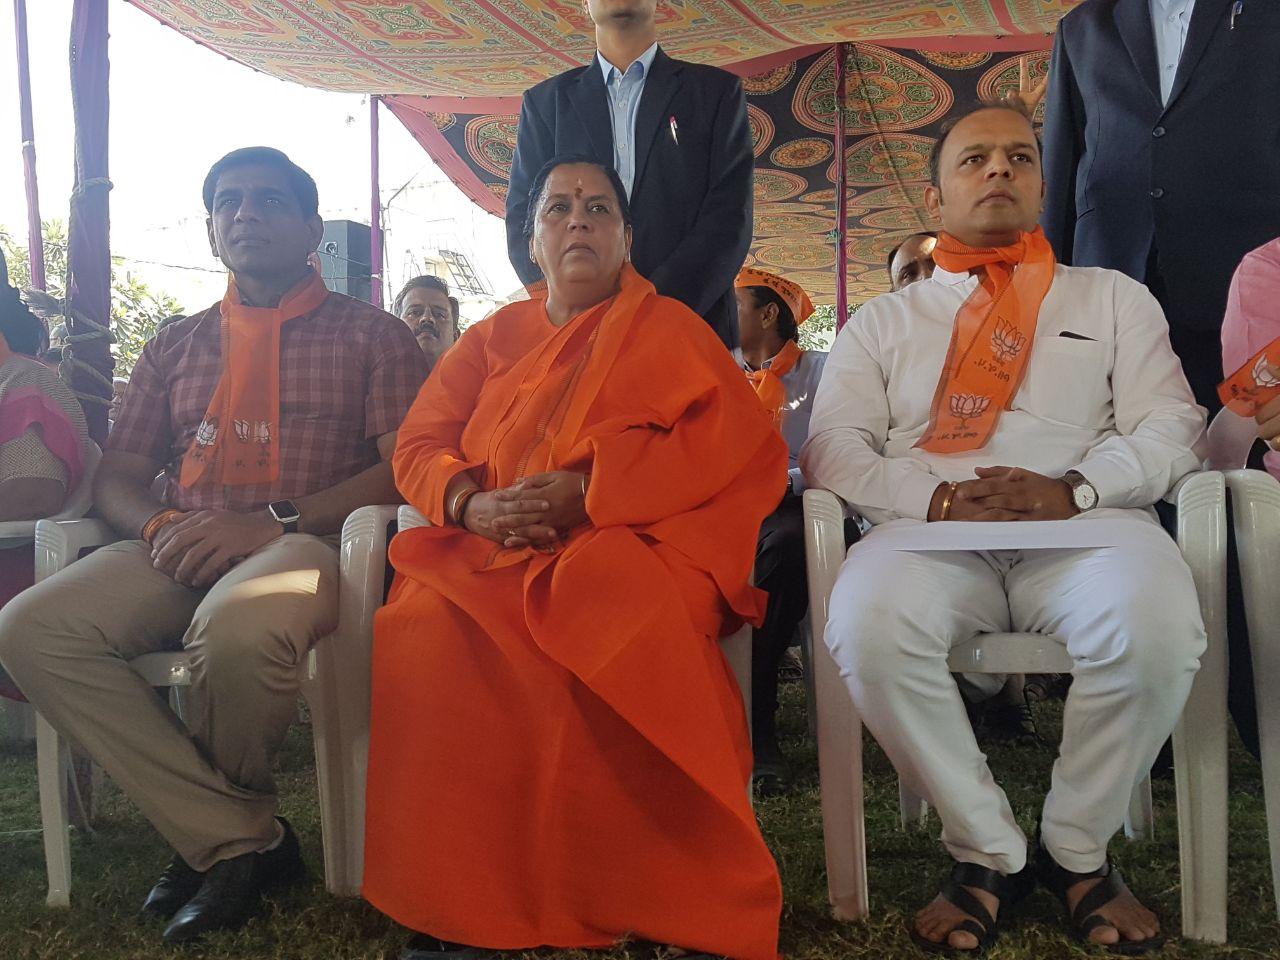 Union Minister Uma Bharati present for Mann ki Baat Chai pe charcha at Vadodara